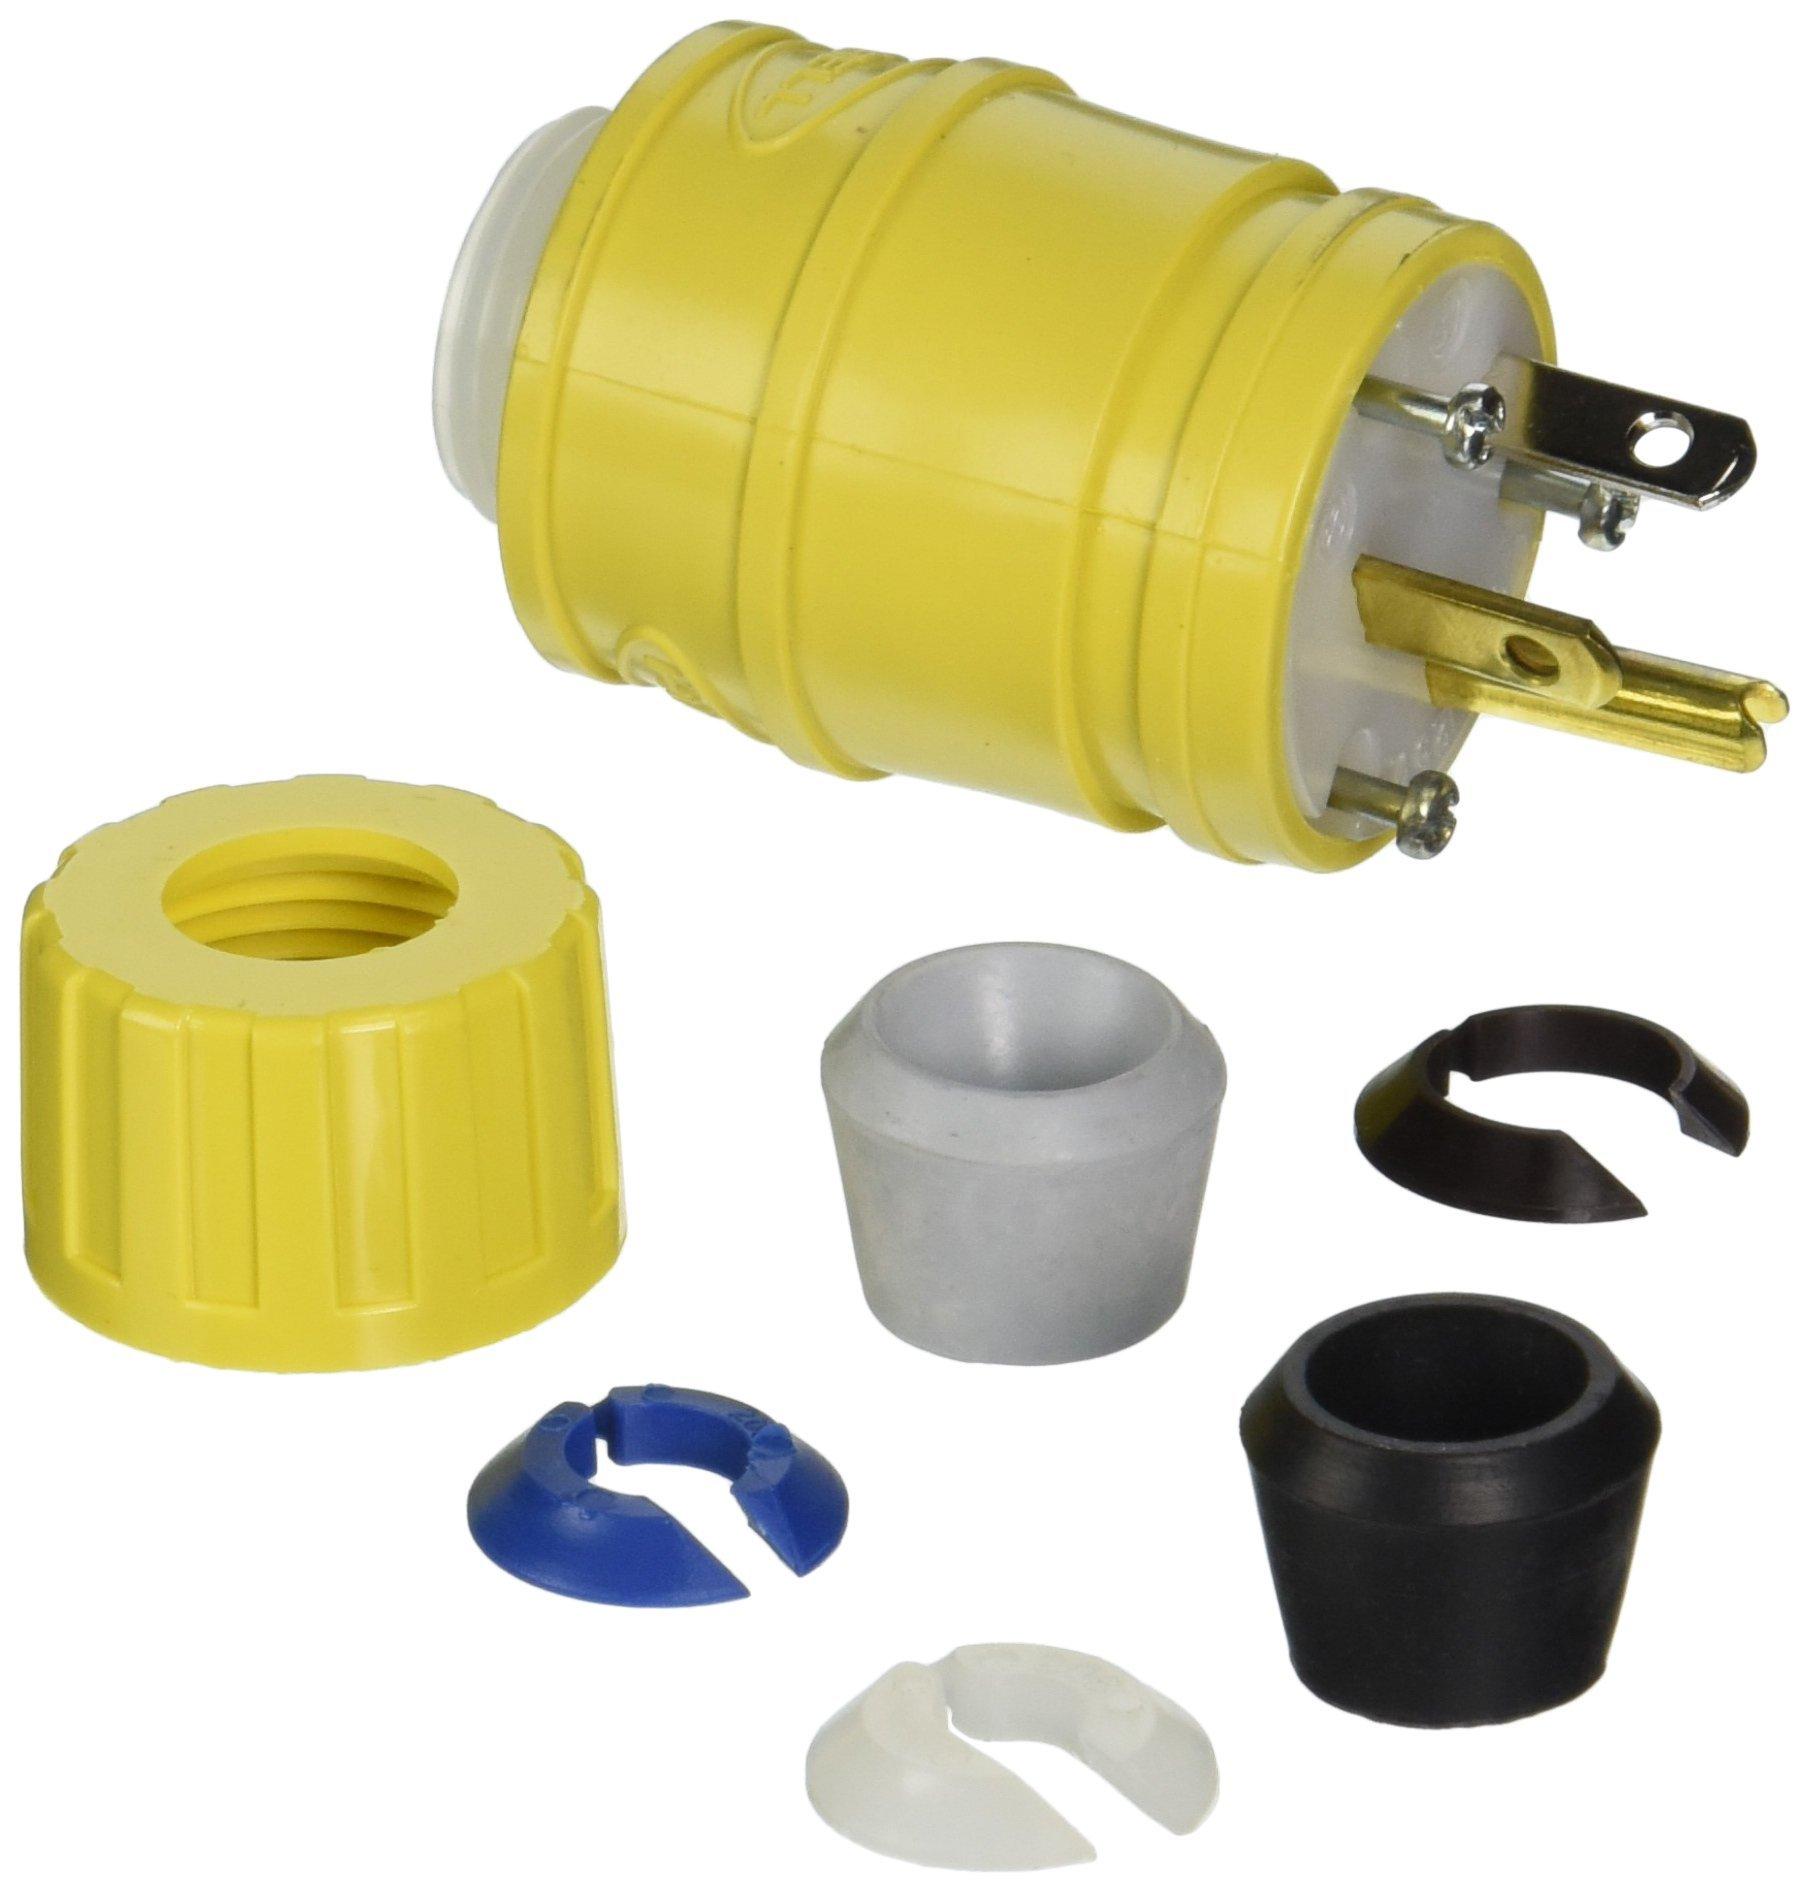 Hubbell HBL14W33 ElastoGrip Watertight Plug, 20 amp, 125V, 5-20P